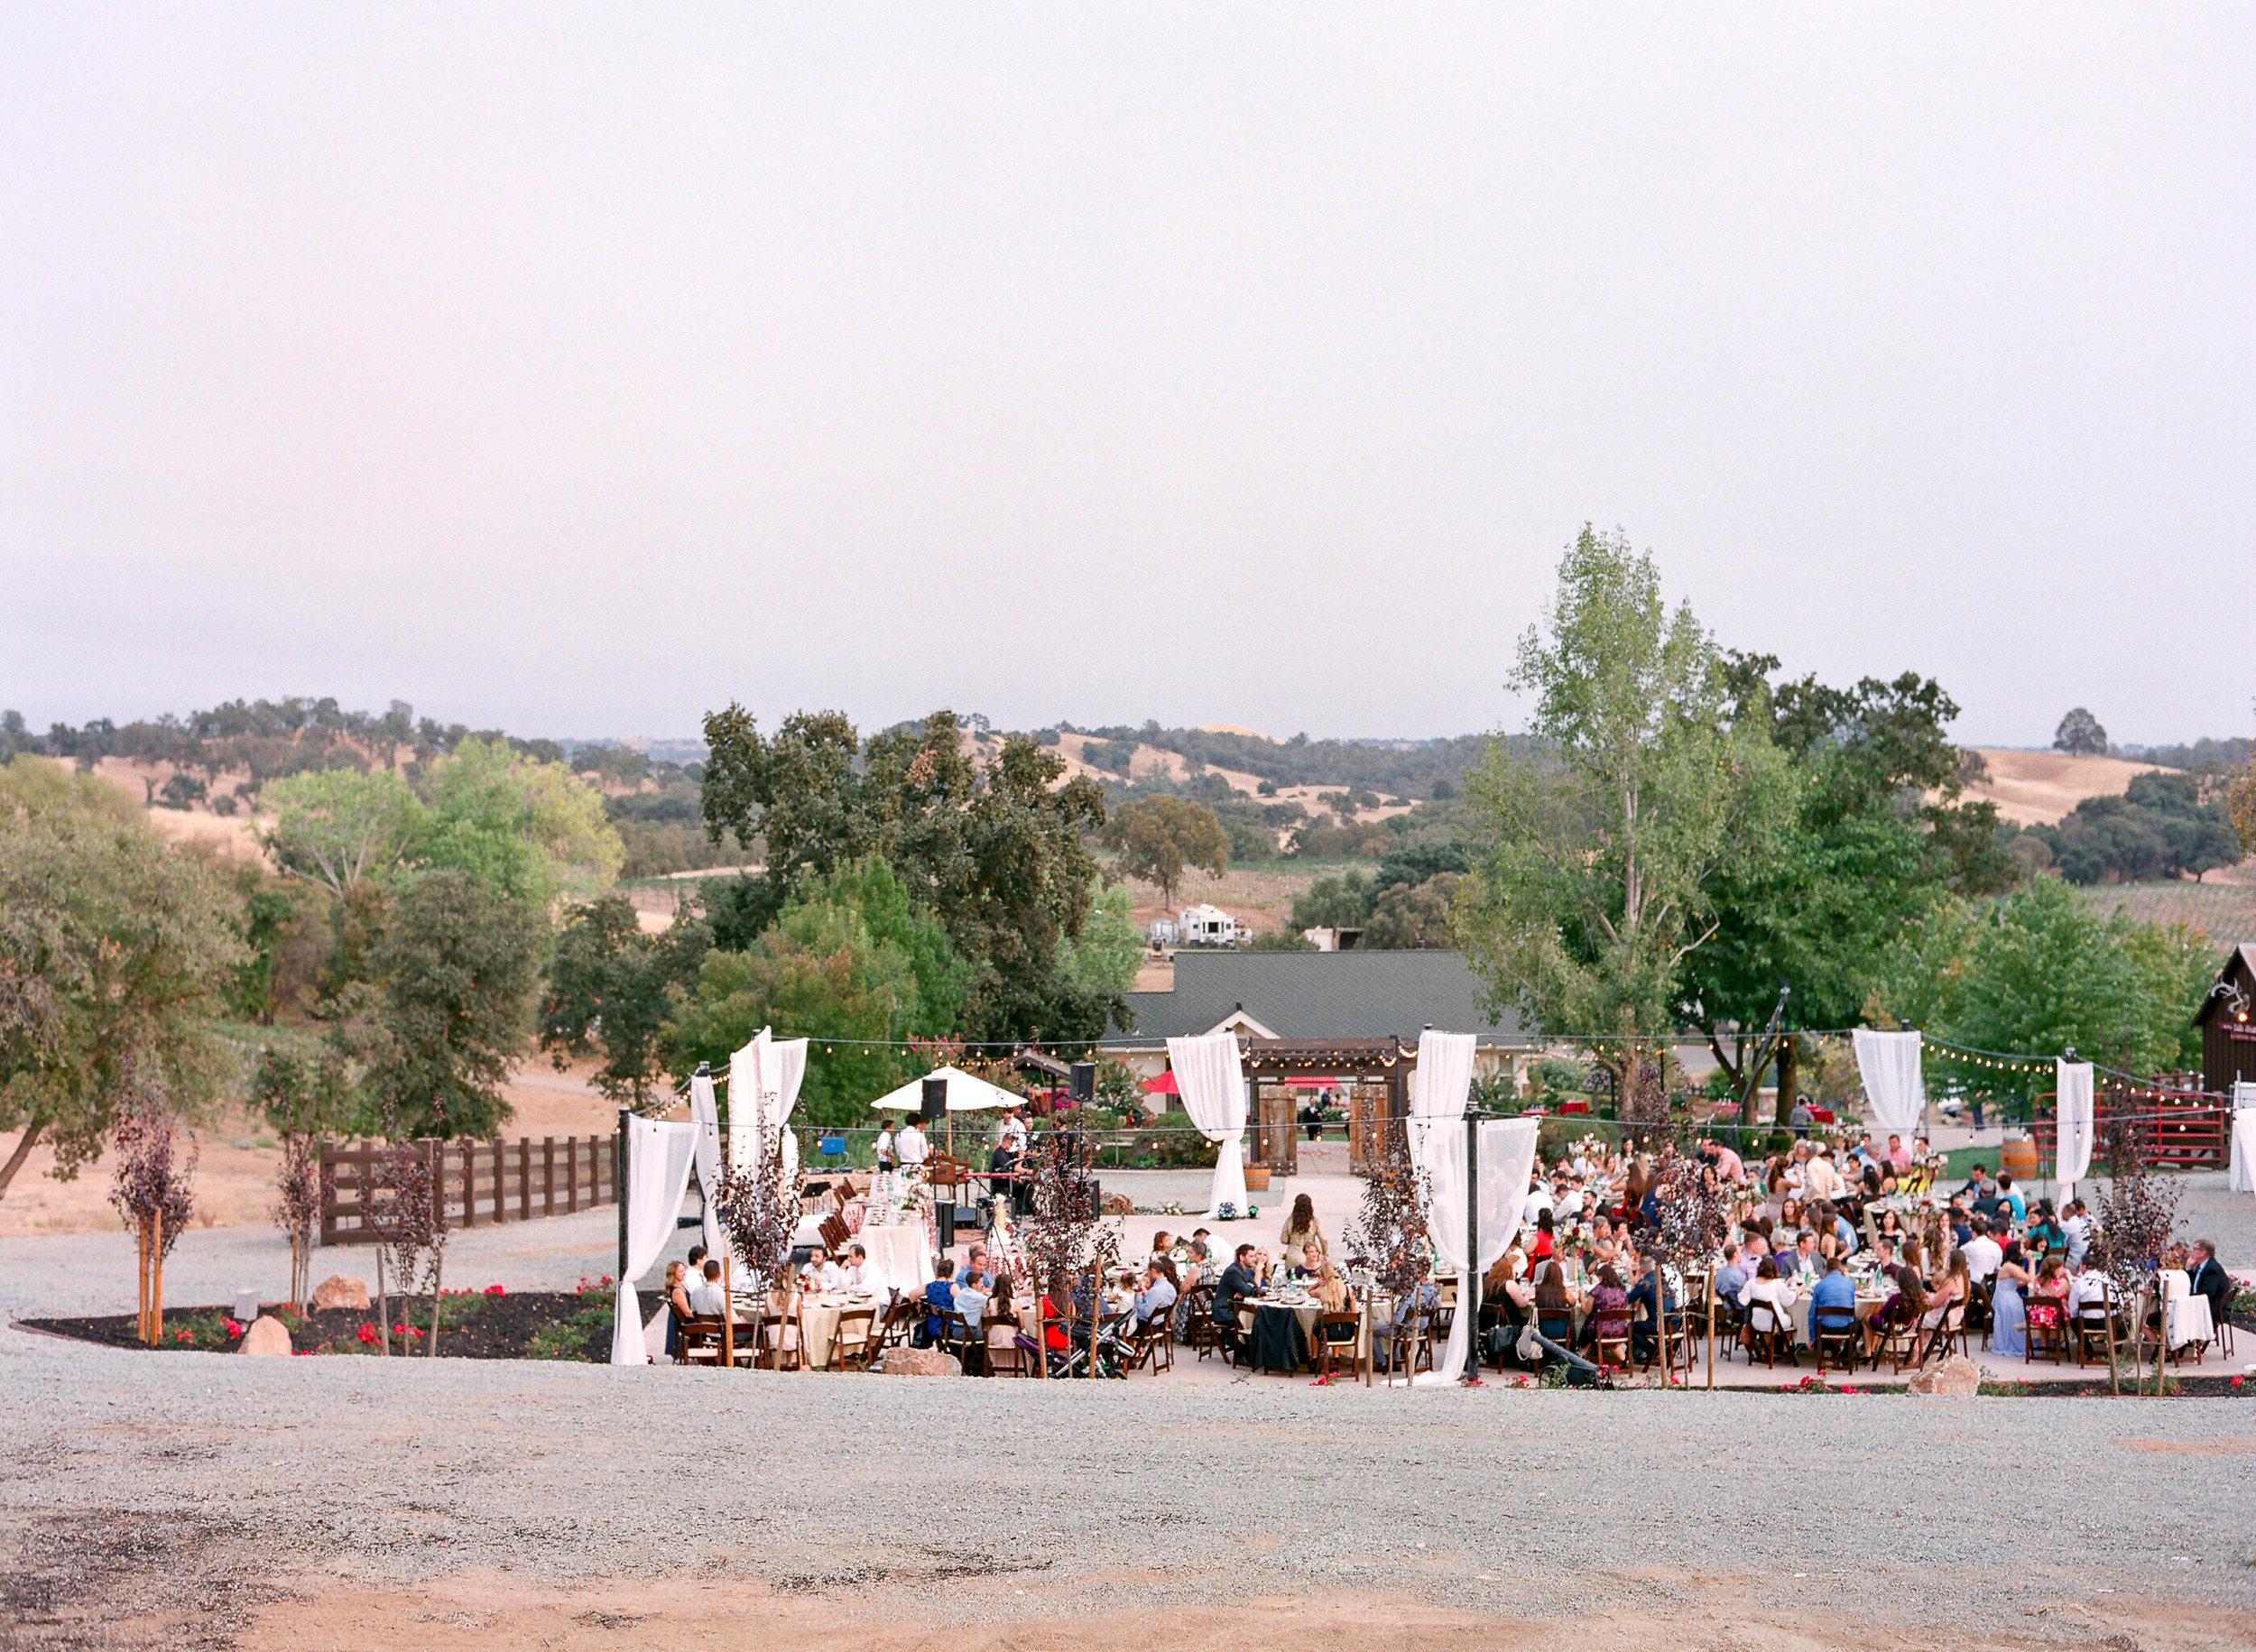 Amador_County_Wedding_Reception_Draping_Lights_Guests_Rancho_Victoria_Vineyard_Northern_California.jpg